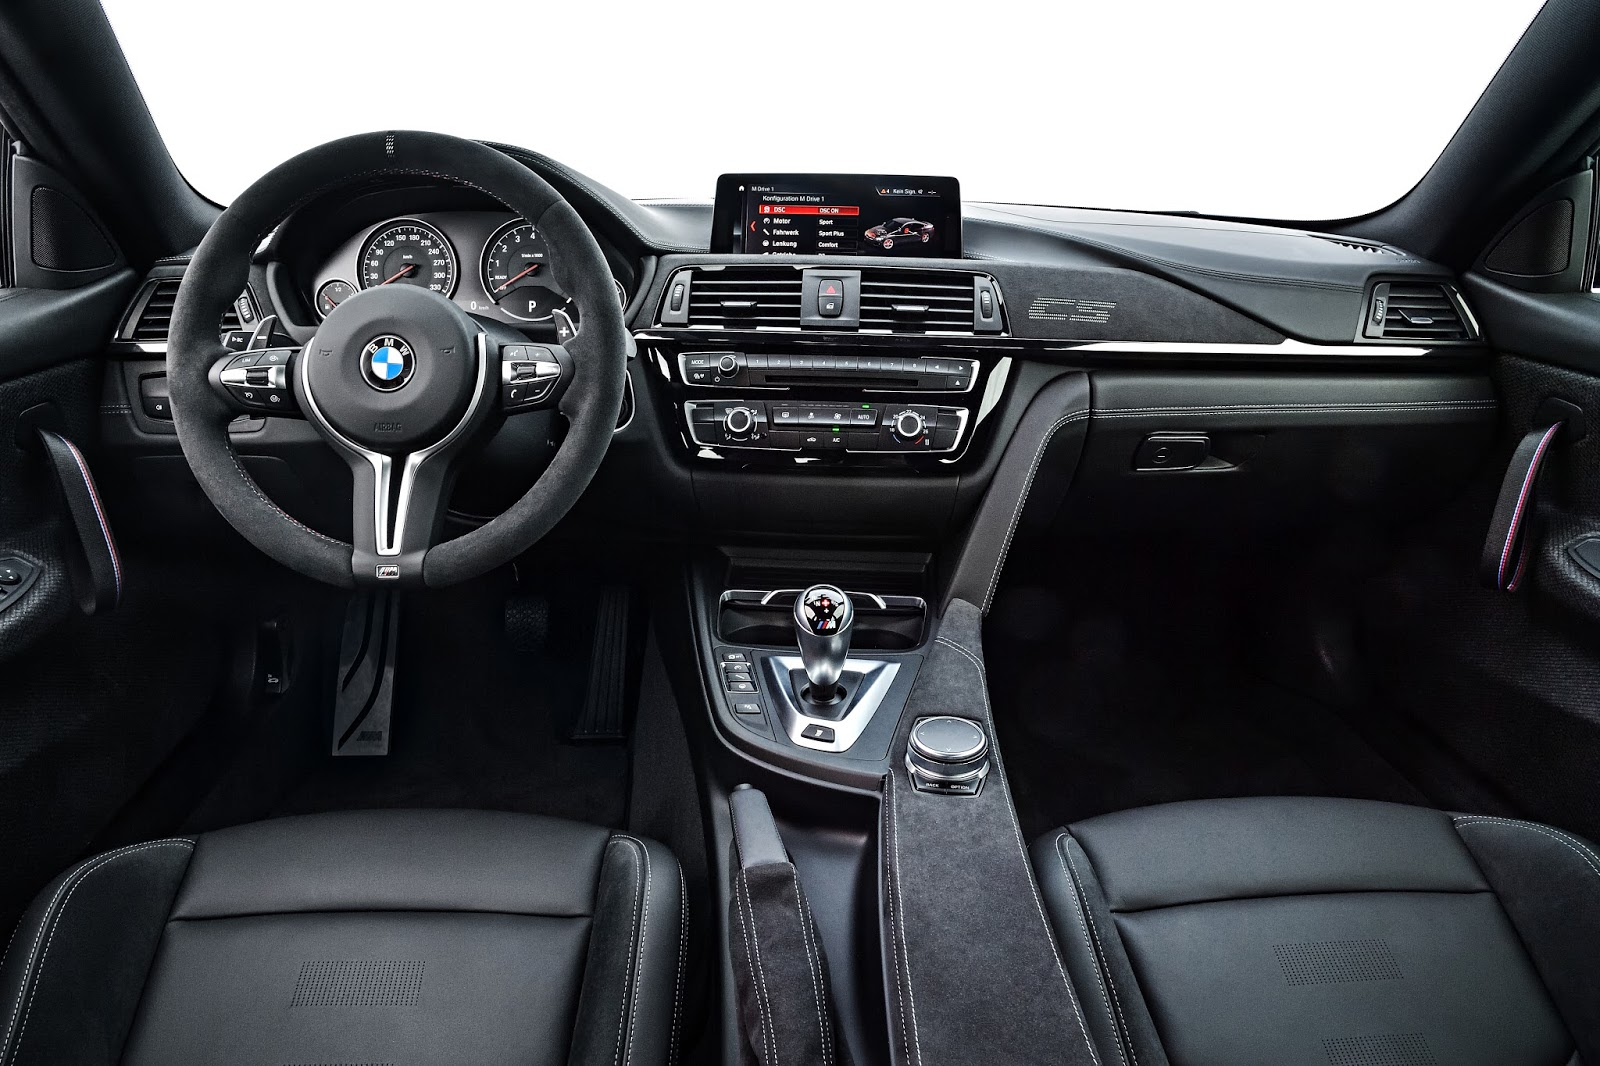 P90251058 highRes the new bmw m4 cs 04 Η περιορισμένης παραγωγής BMW M4 ClubSport δική σας με 116.900 ευρώ BMW, BMW M, BMW M4, BMW M4 CS, BMW Motorsport, clubsport, COUPE, Limited edition, supercars, supersport, videos, Περιορισμένης παραγωγής